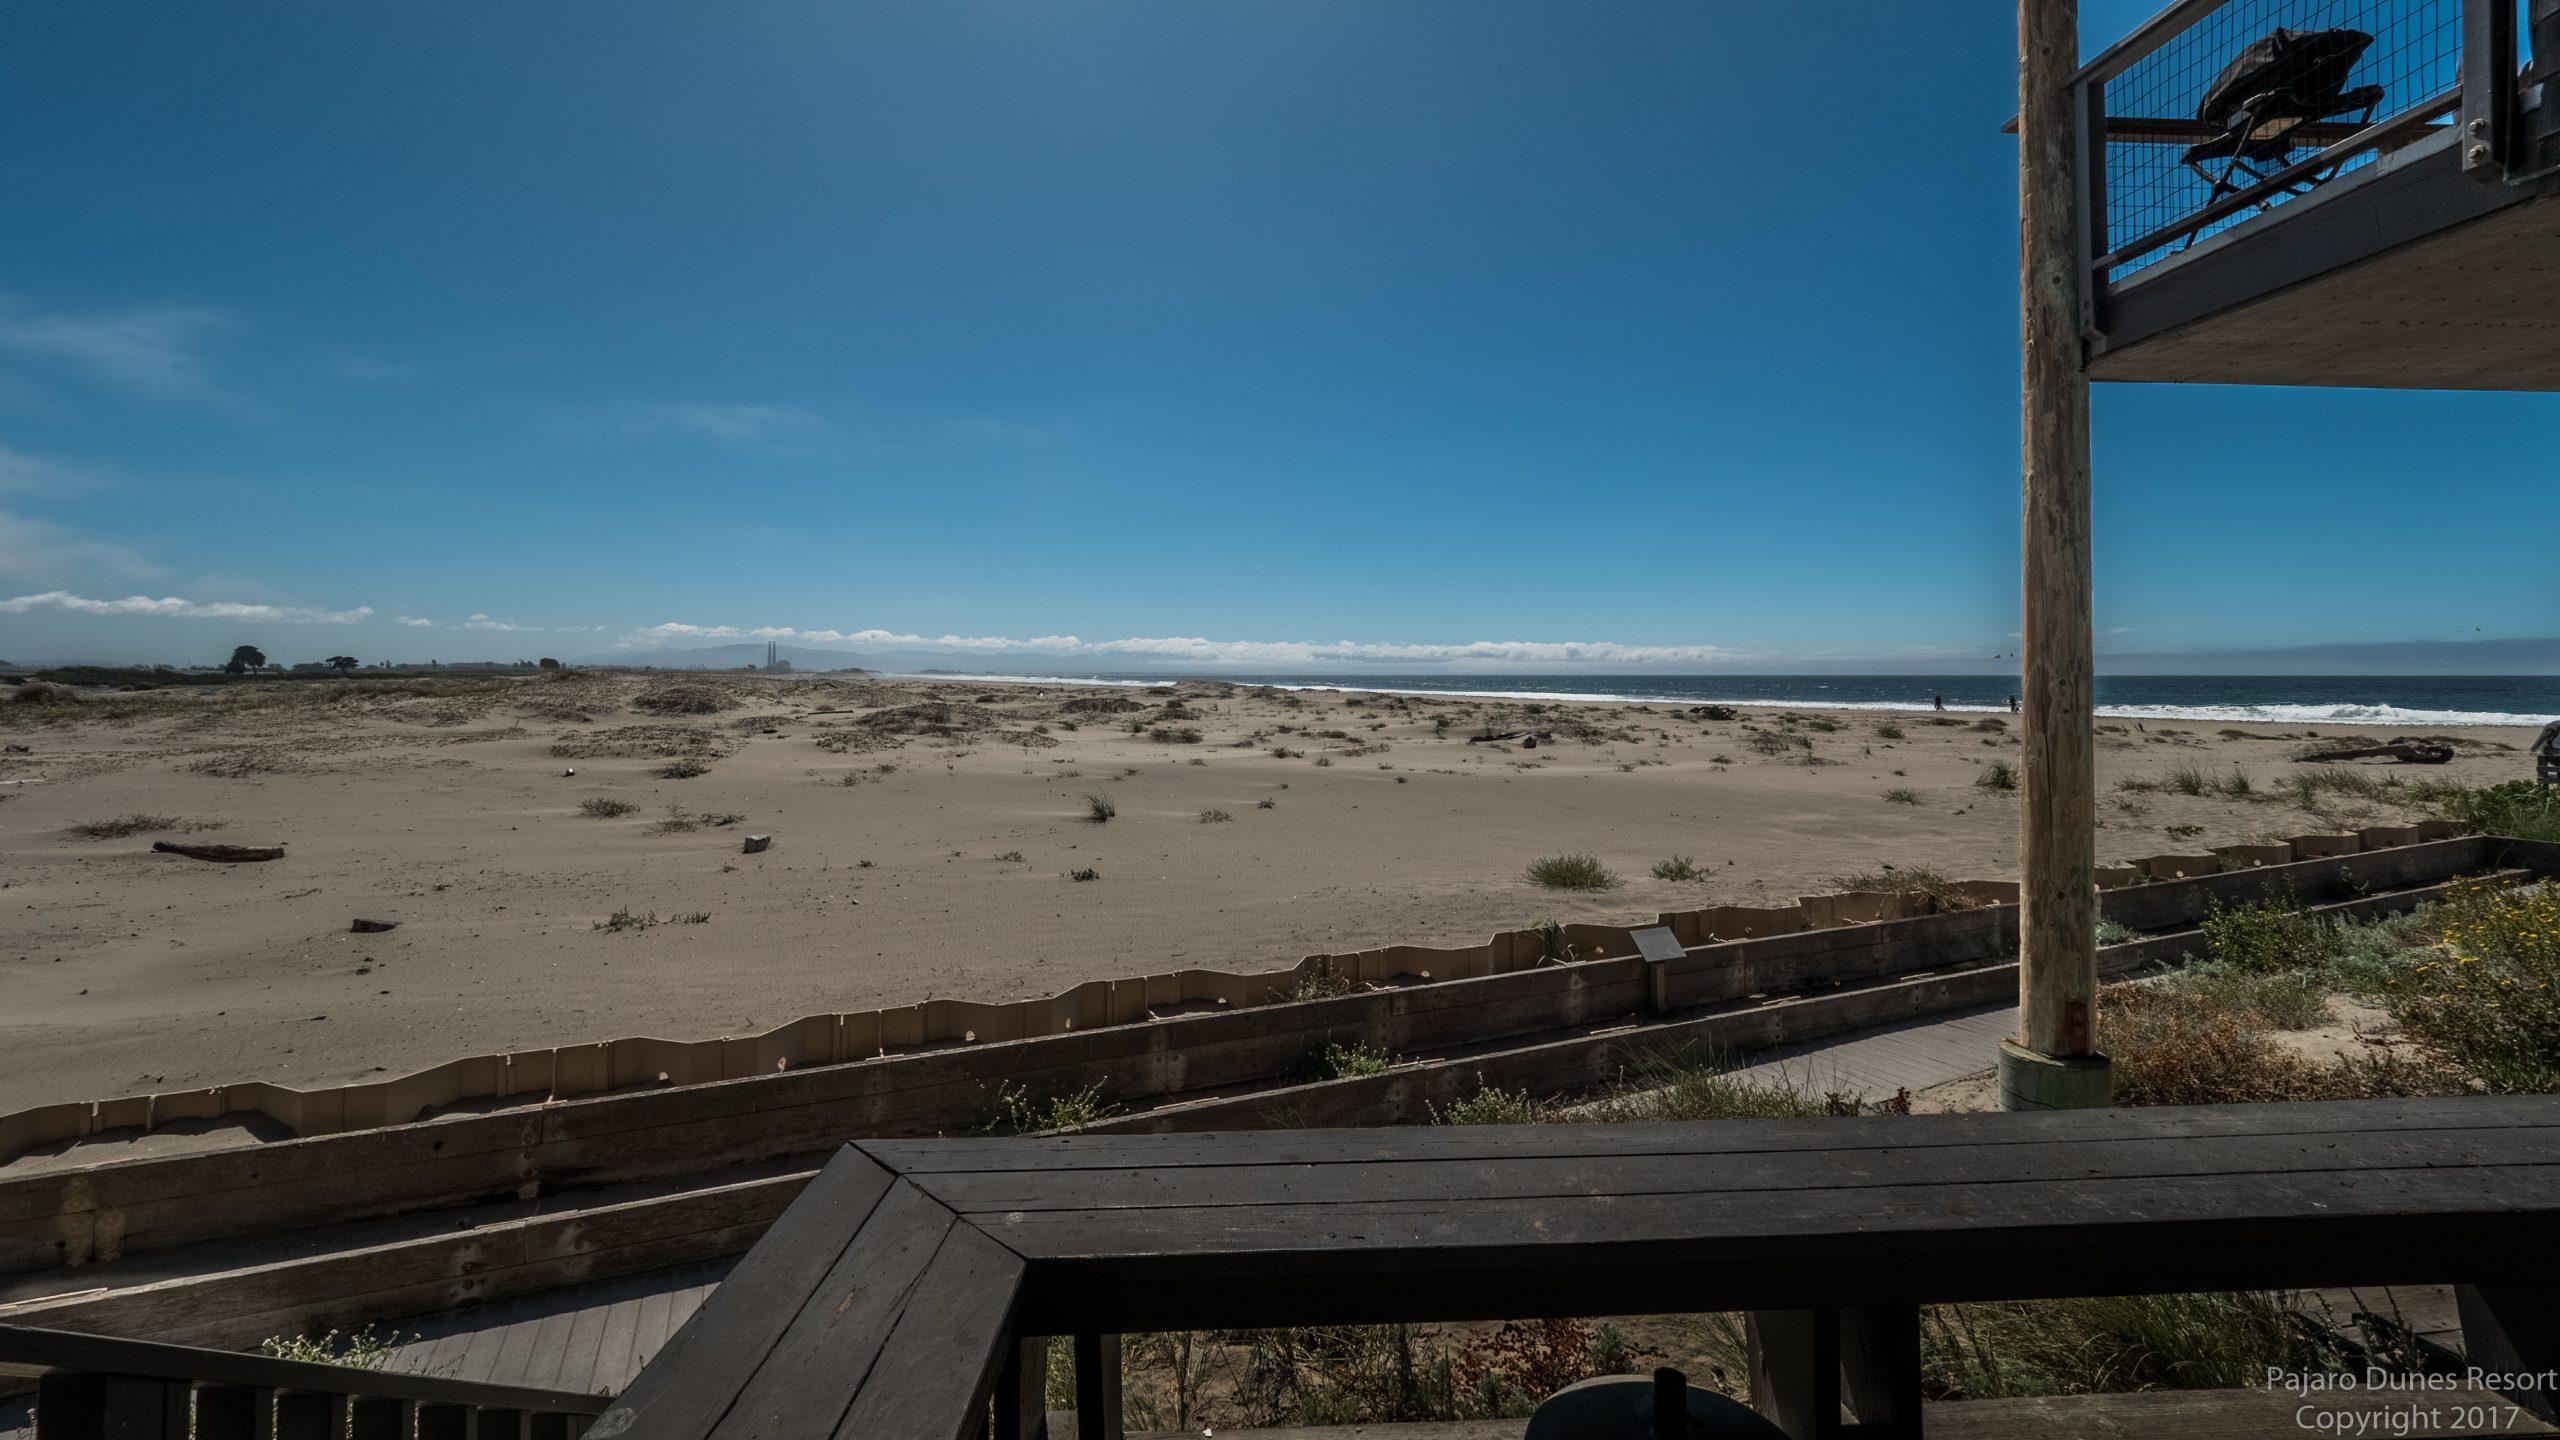 Pajaro Dunes Pelican 28 Image 3